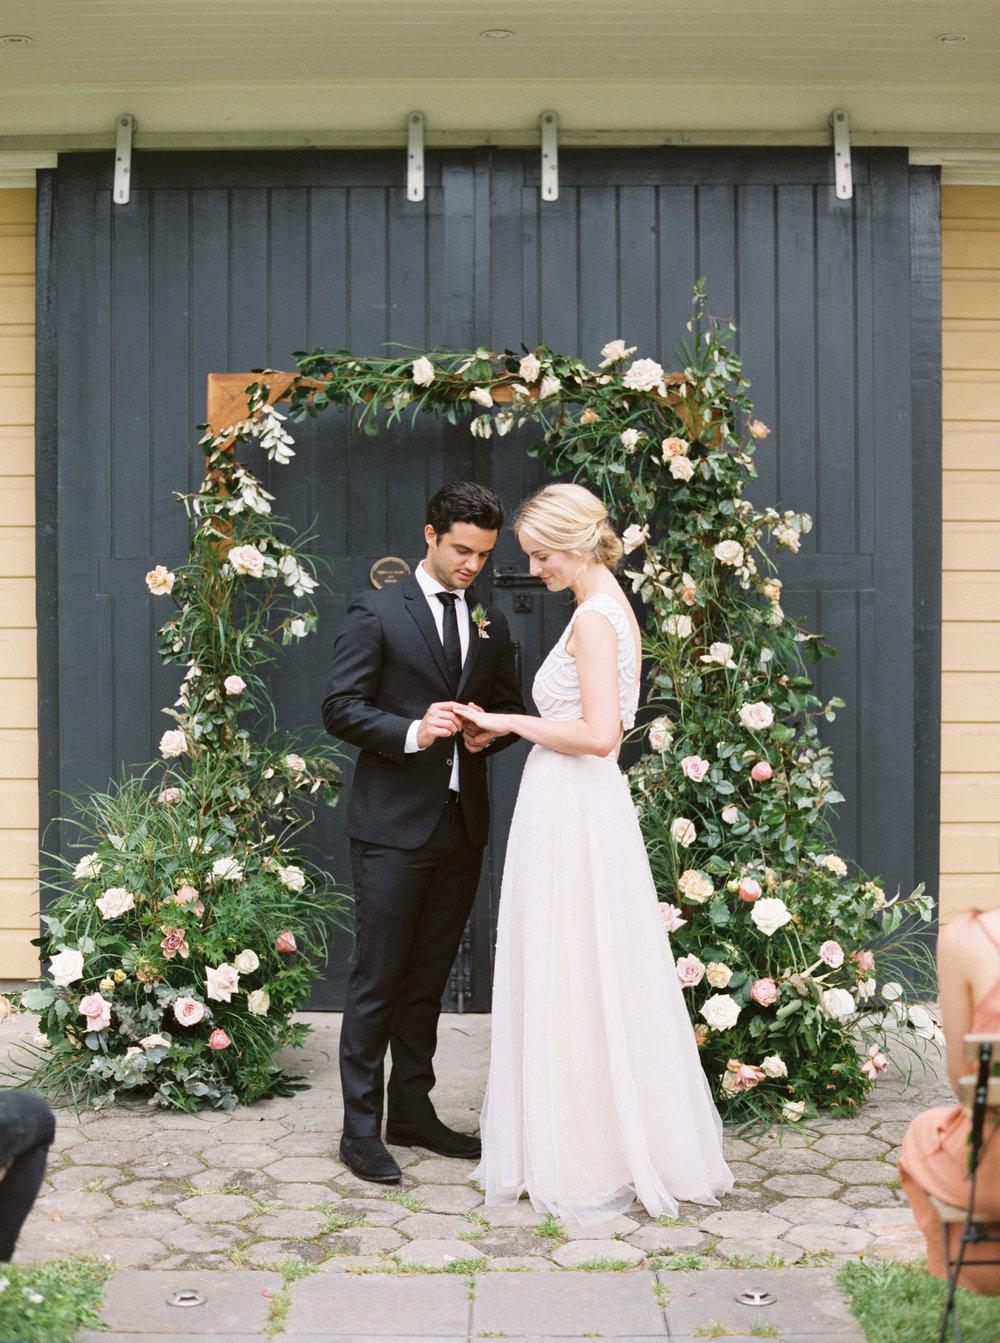 Timeless Southern Highland Wedding Elopement in Bowral NSW Fine Art Film Photographer Sheri McMahon-20.jpg